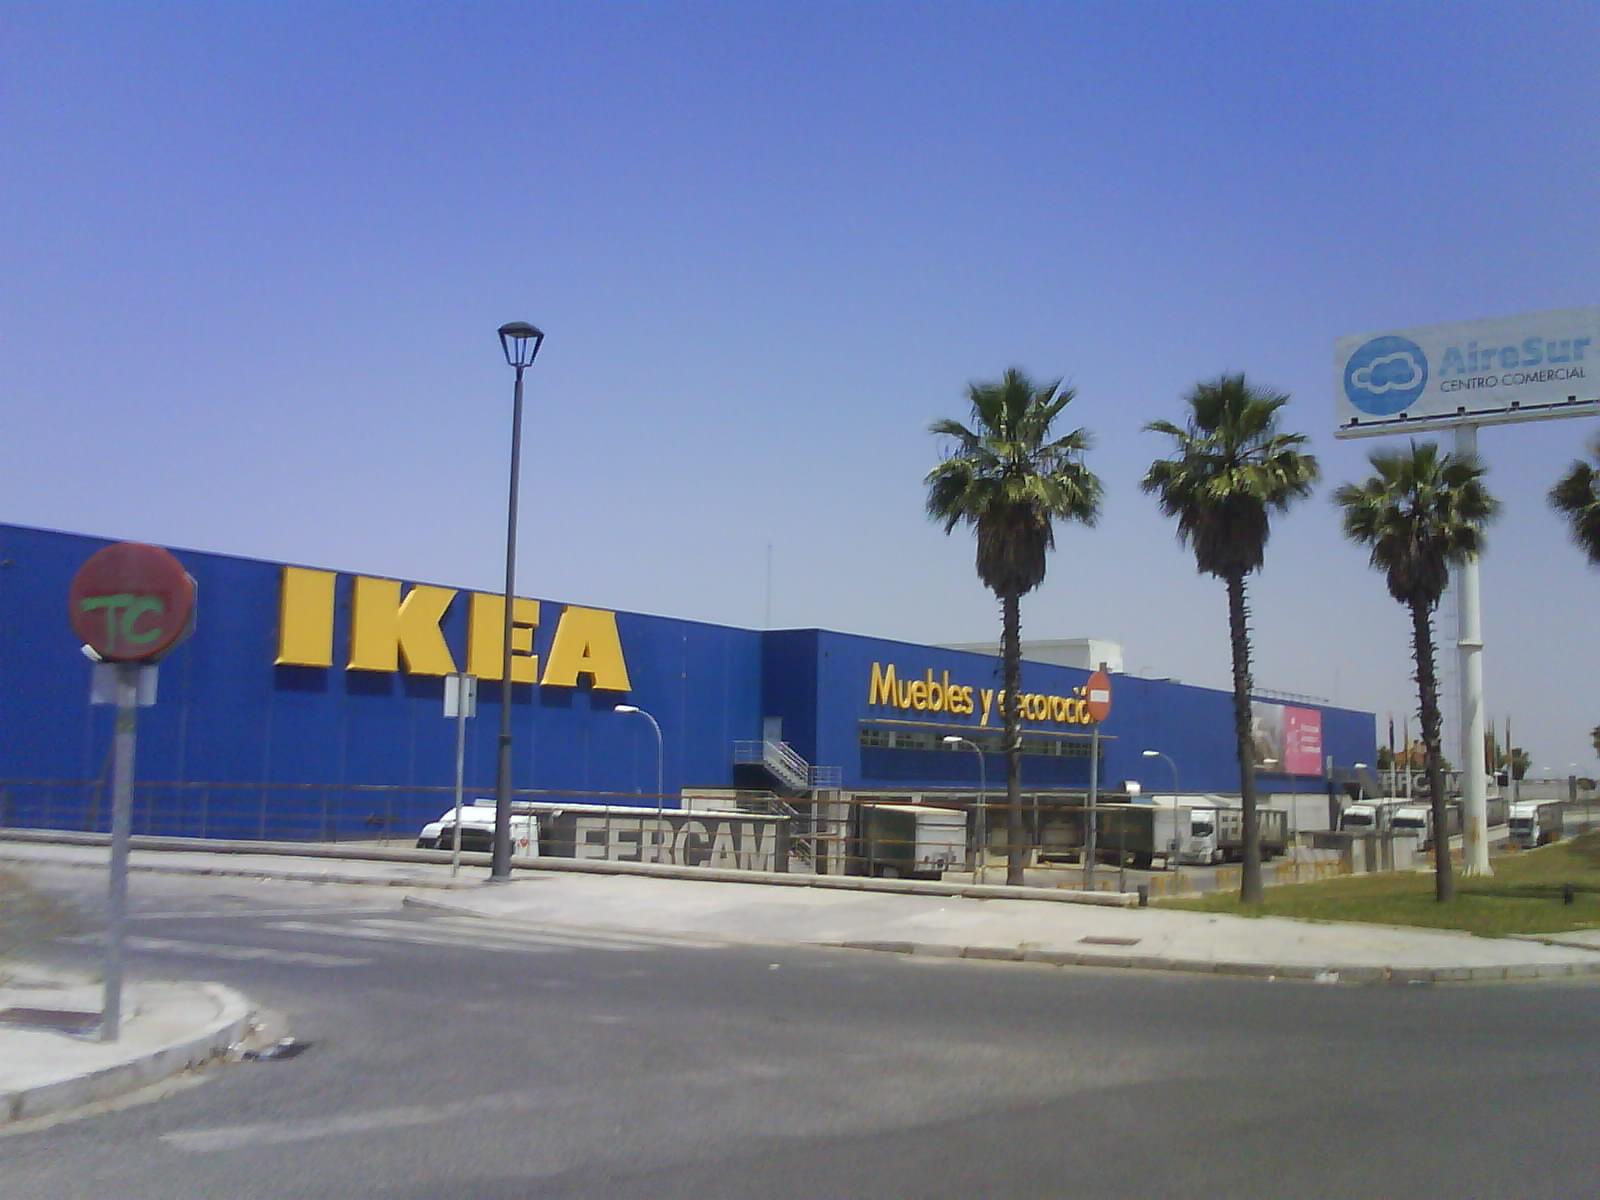 Paoctubre paoctubre en busca del ikea perdido - Ikea de sevilla ...